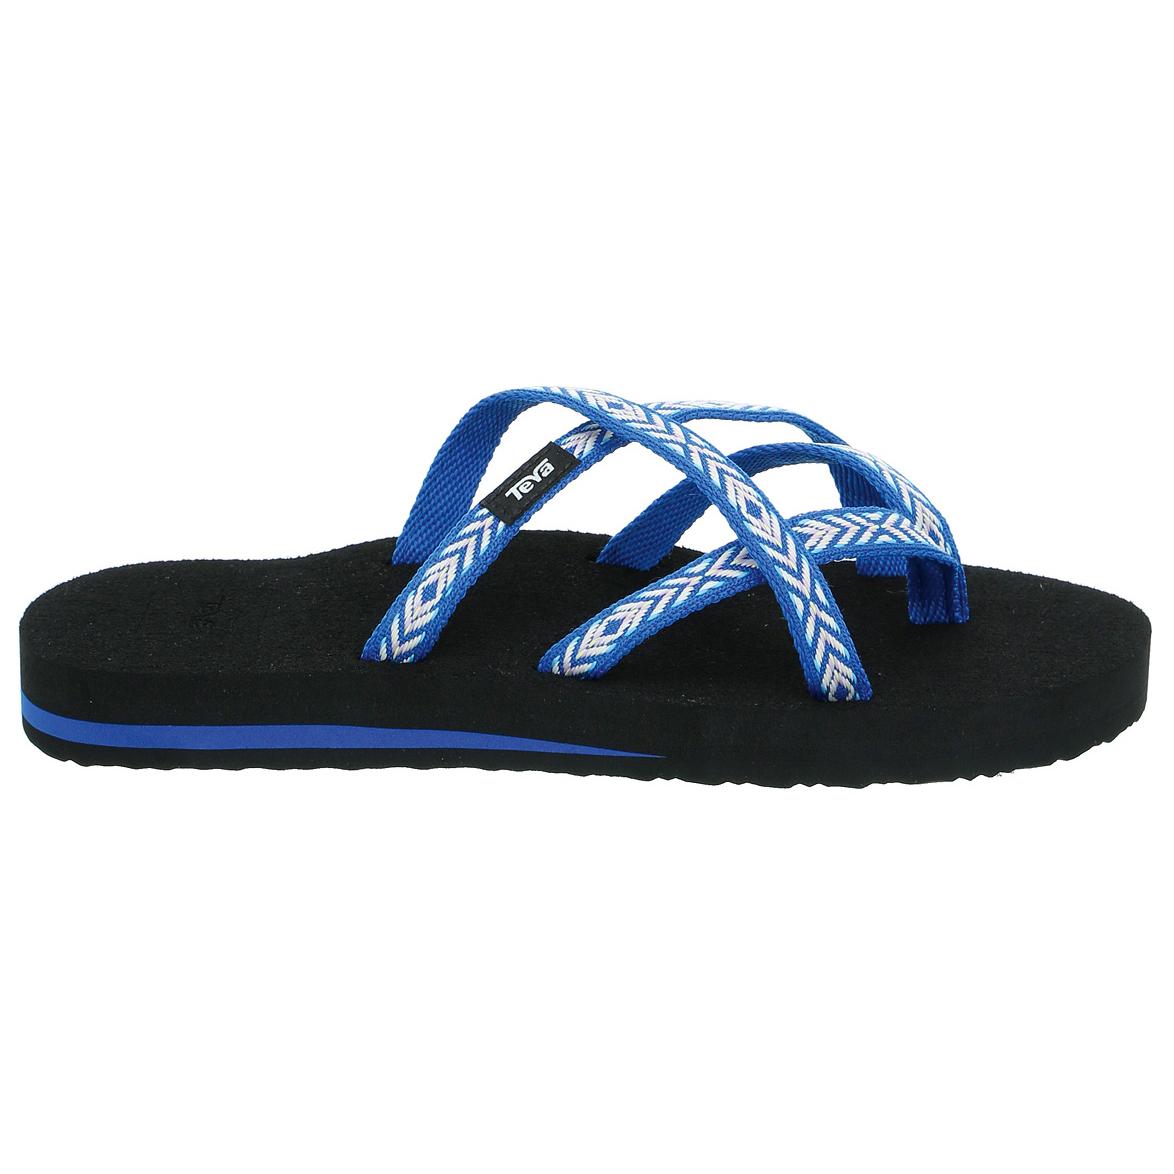 a303fd38e Teva - Women s Olowahu - Sandals ...